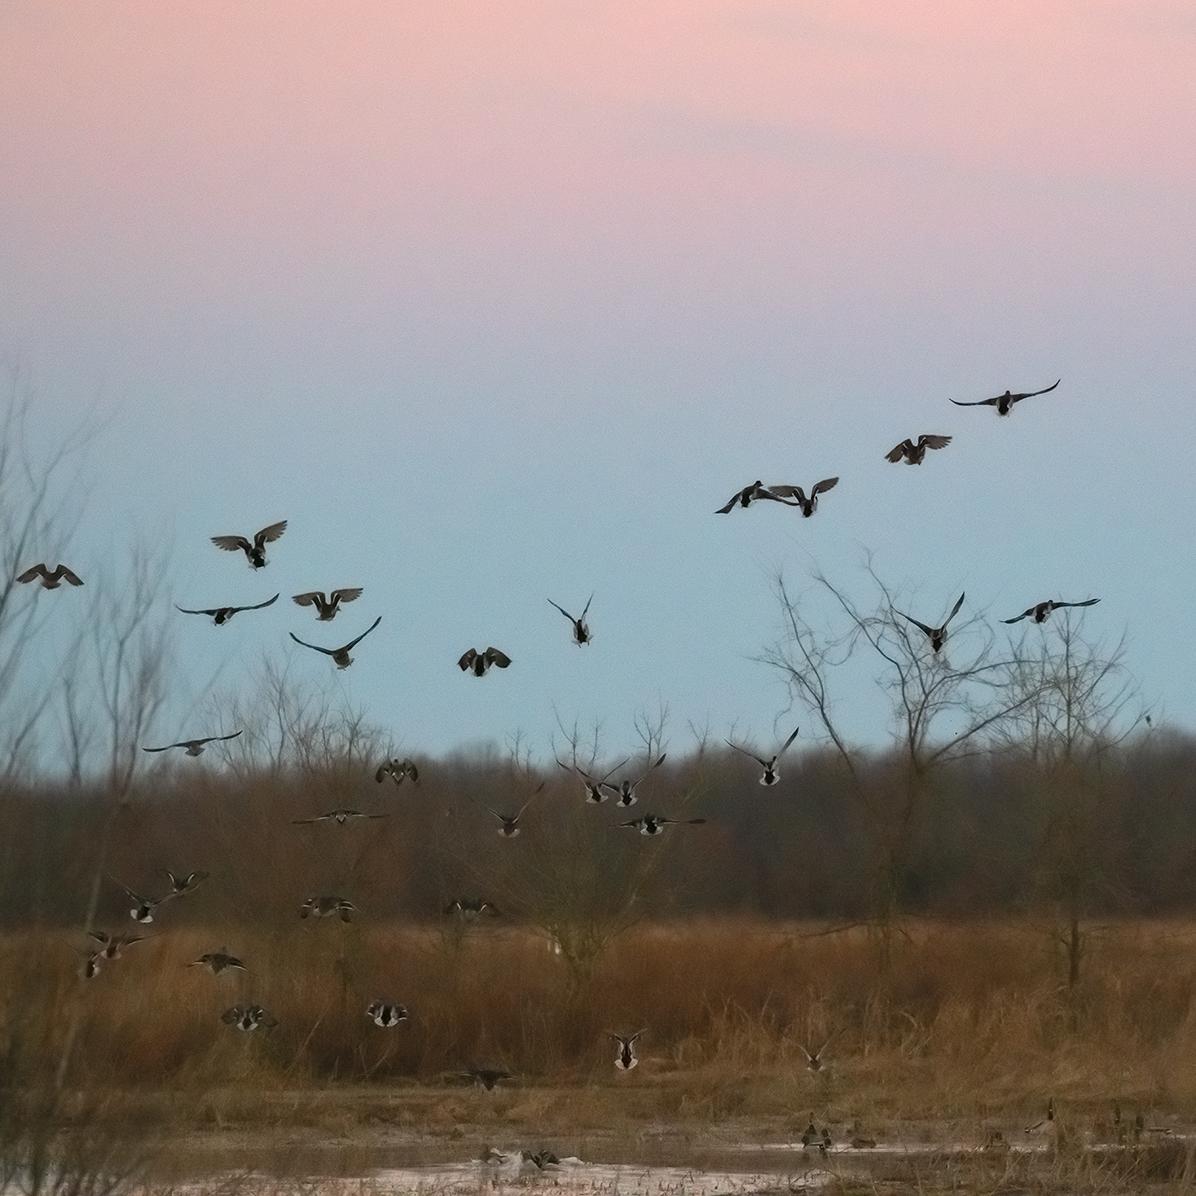 Ducks Taking Flight